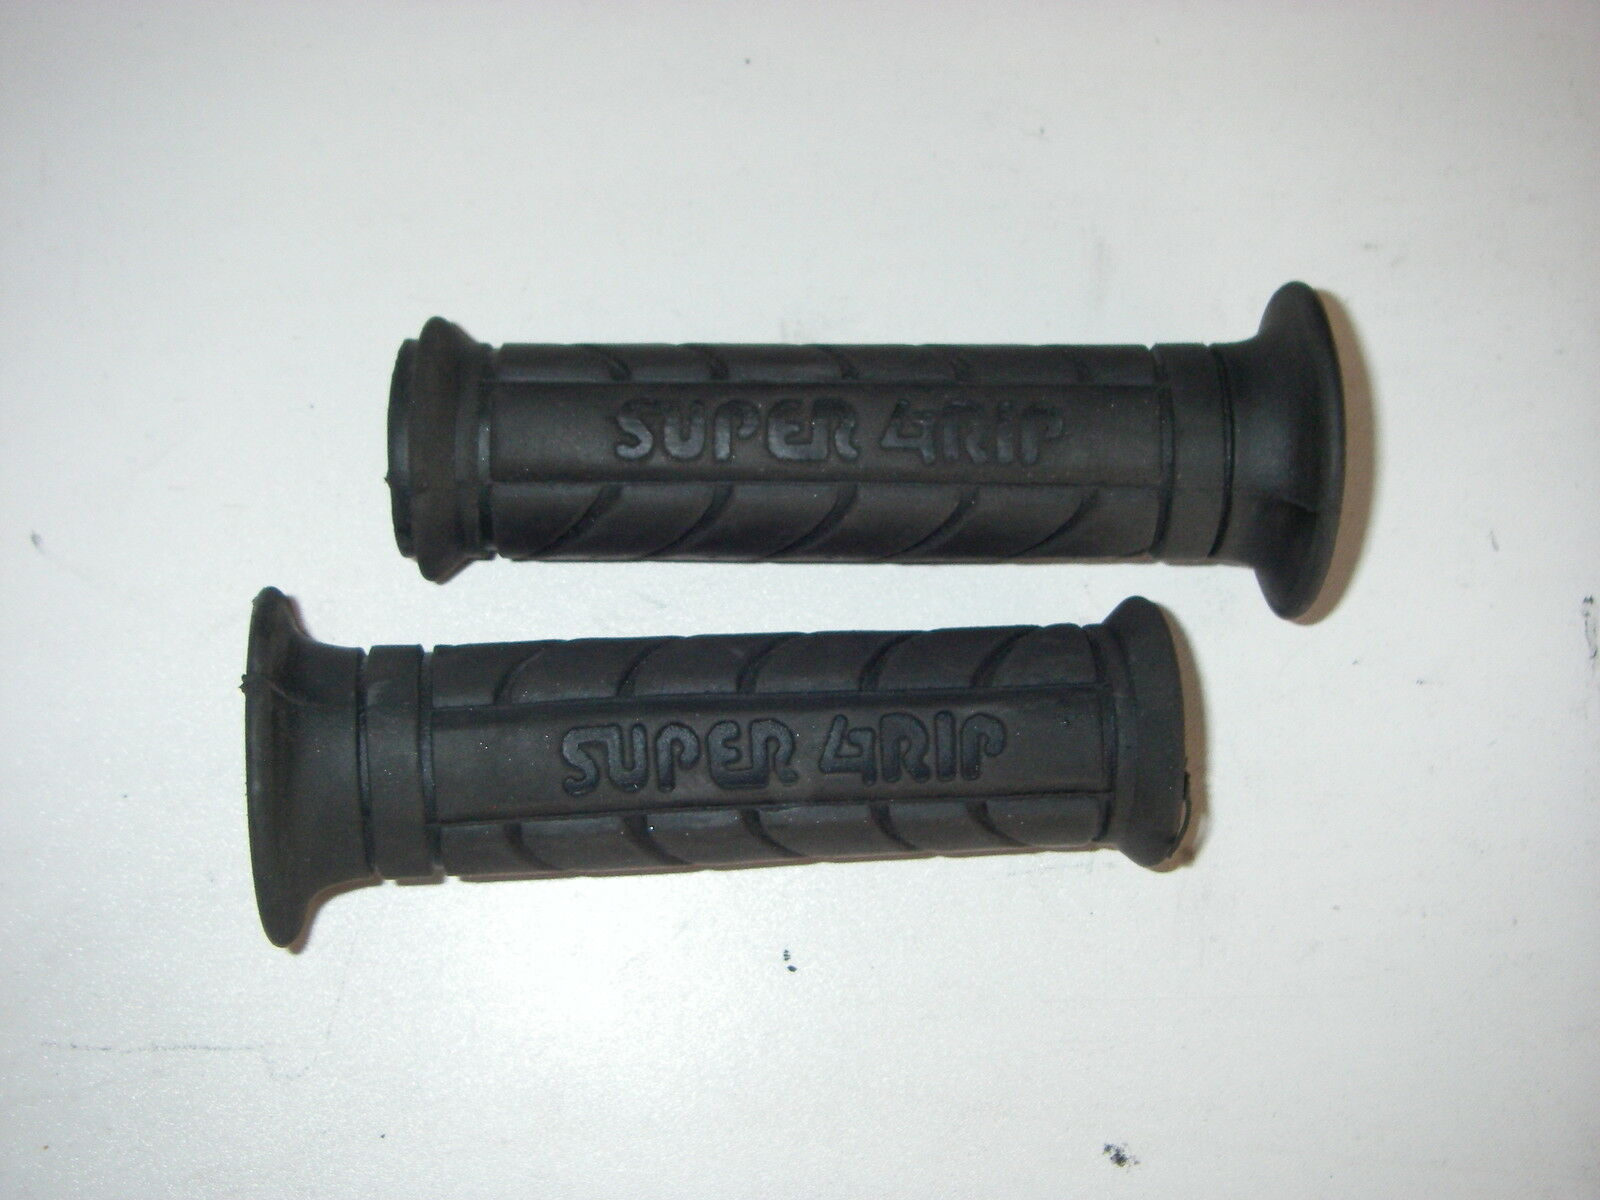 YAMAHA PW50 Lenker Griffe Griffgummis //Handlebar Grips 4X4-26242-00 4X4-26241-00